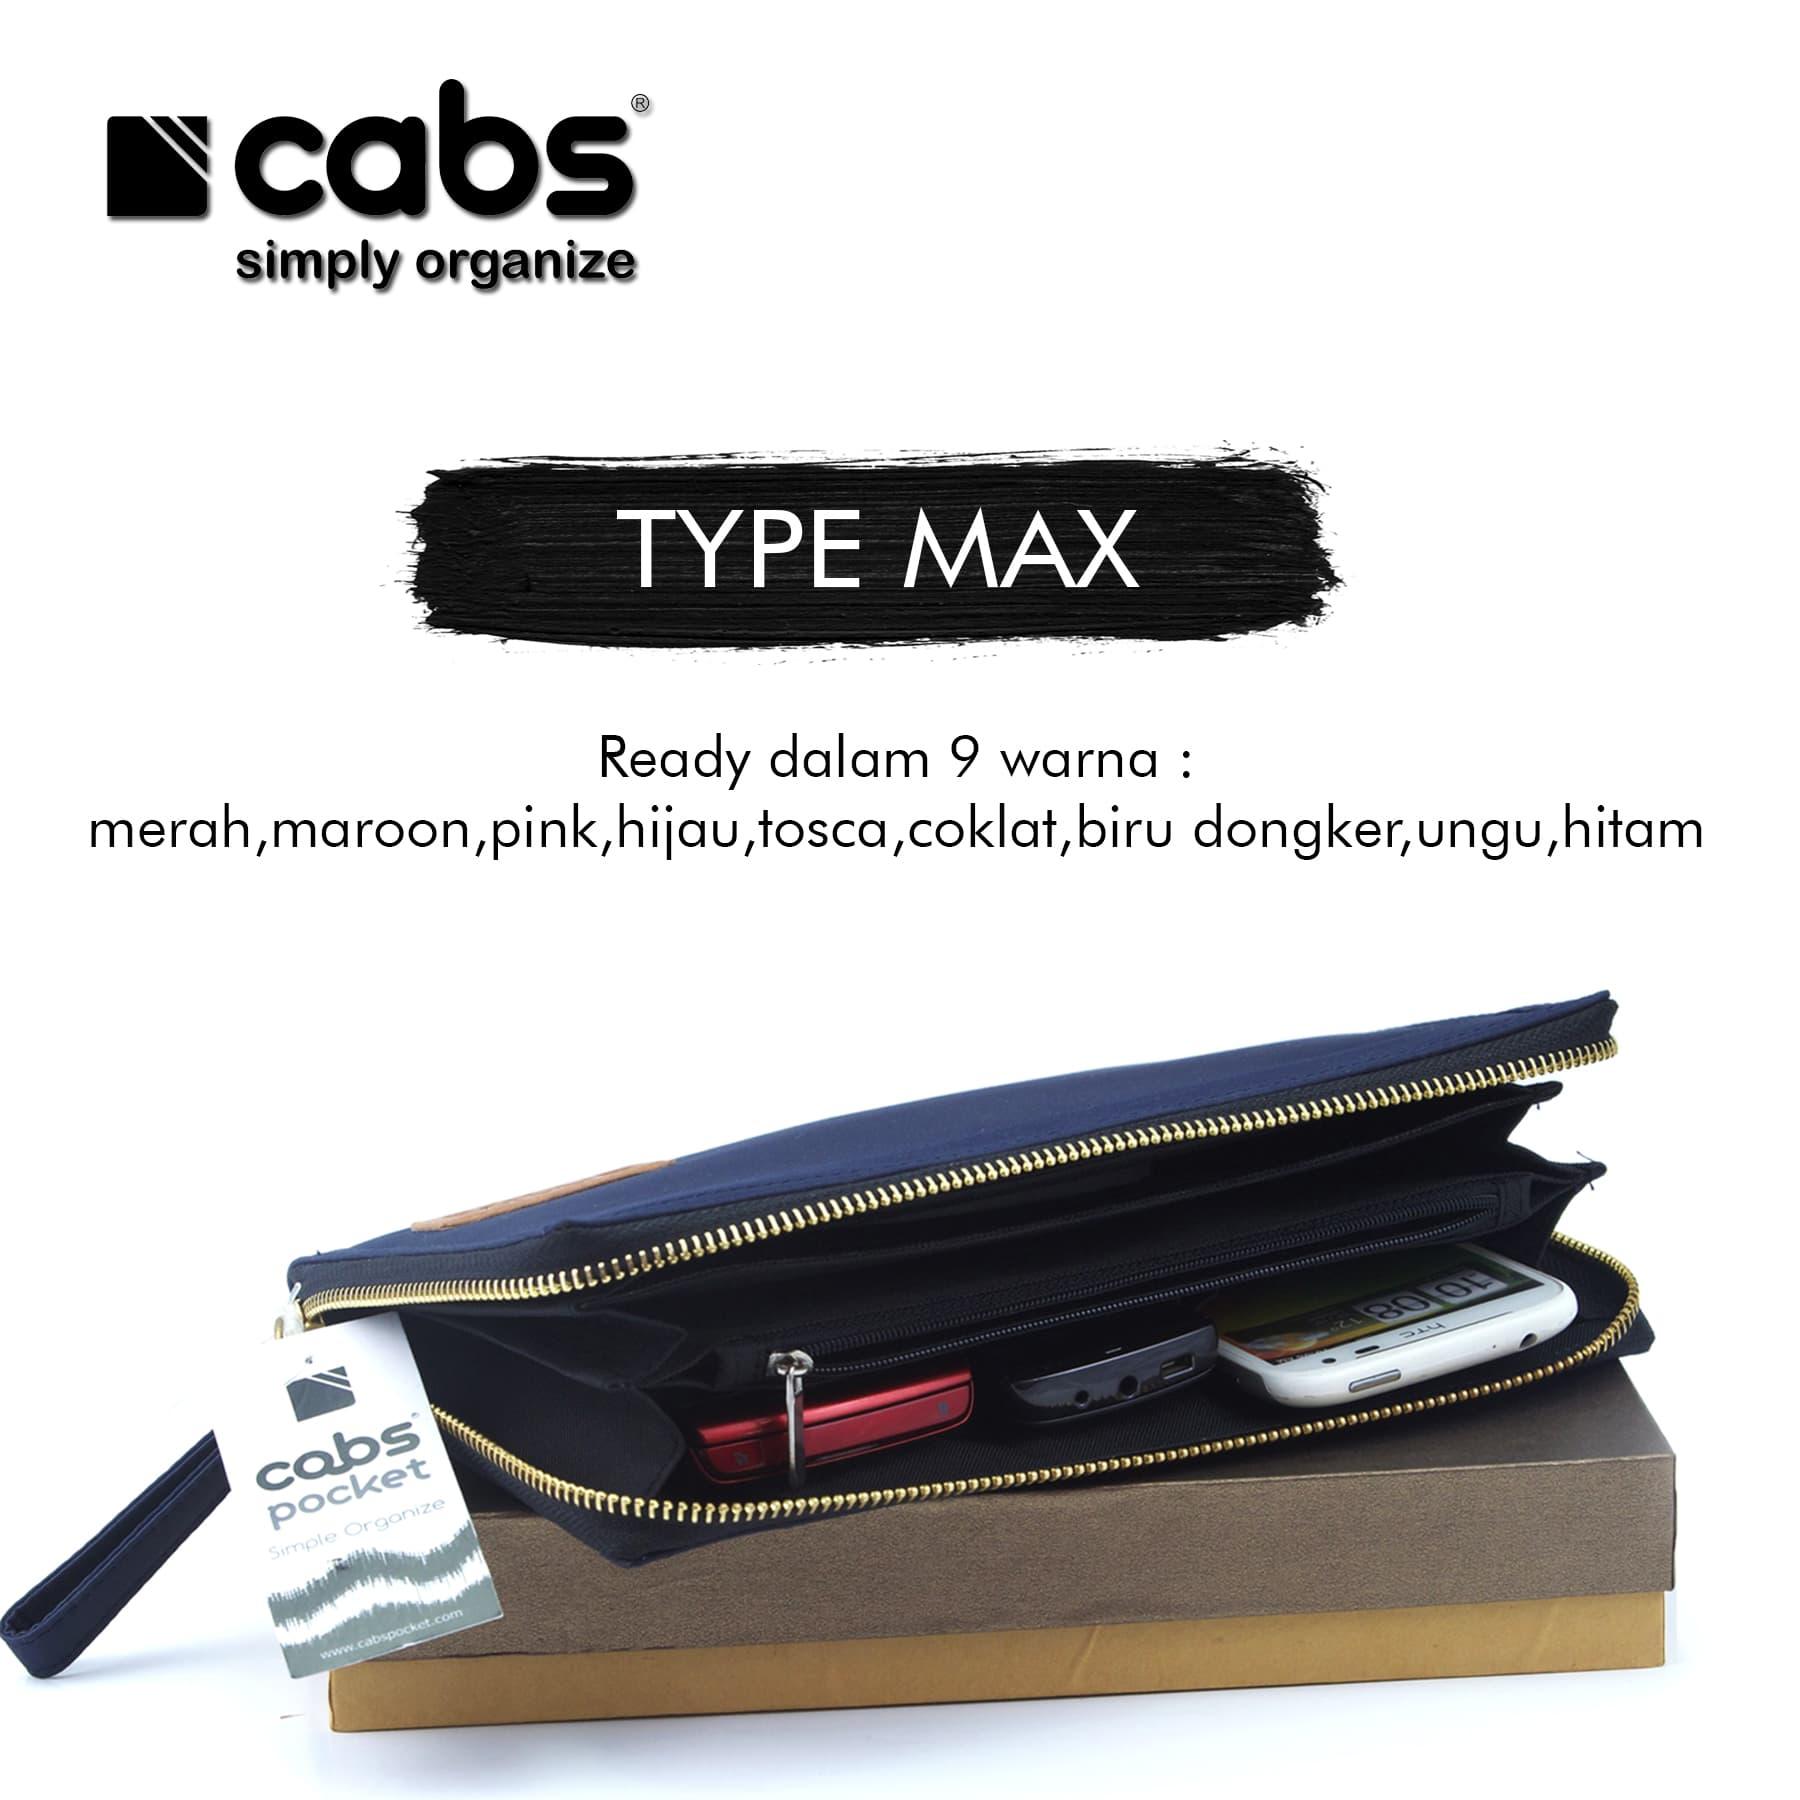 Cabs Pocket Max (Dompet Serbaguna Hpo Organizer Untuk Pria & Wanita Dompet .